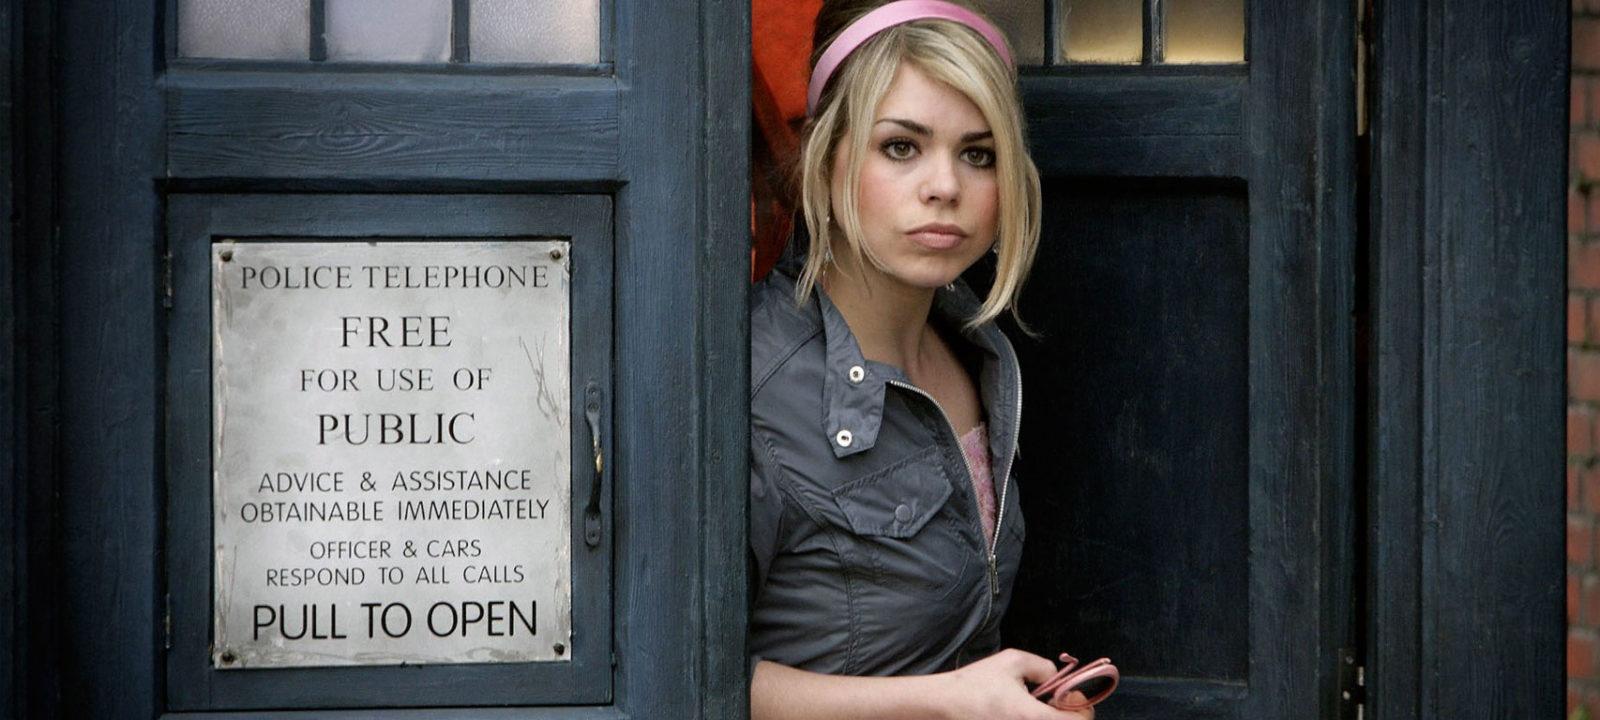 Doctor Who – 'The Idiot's Lantern' (Photo: BBC)